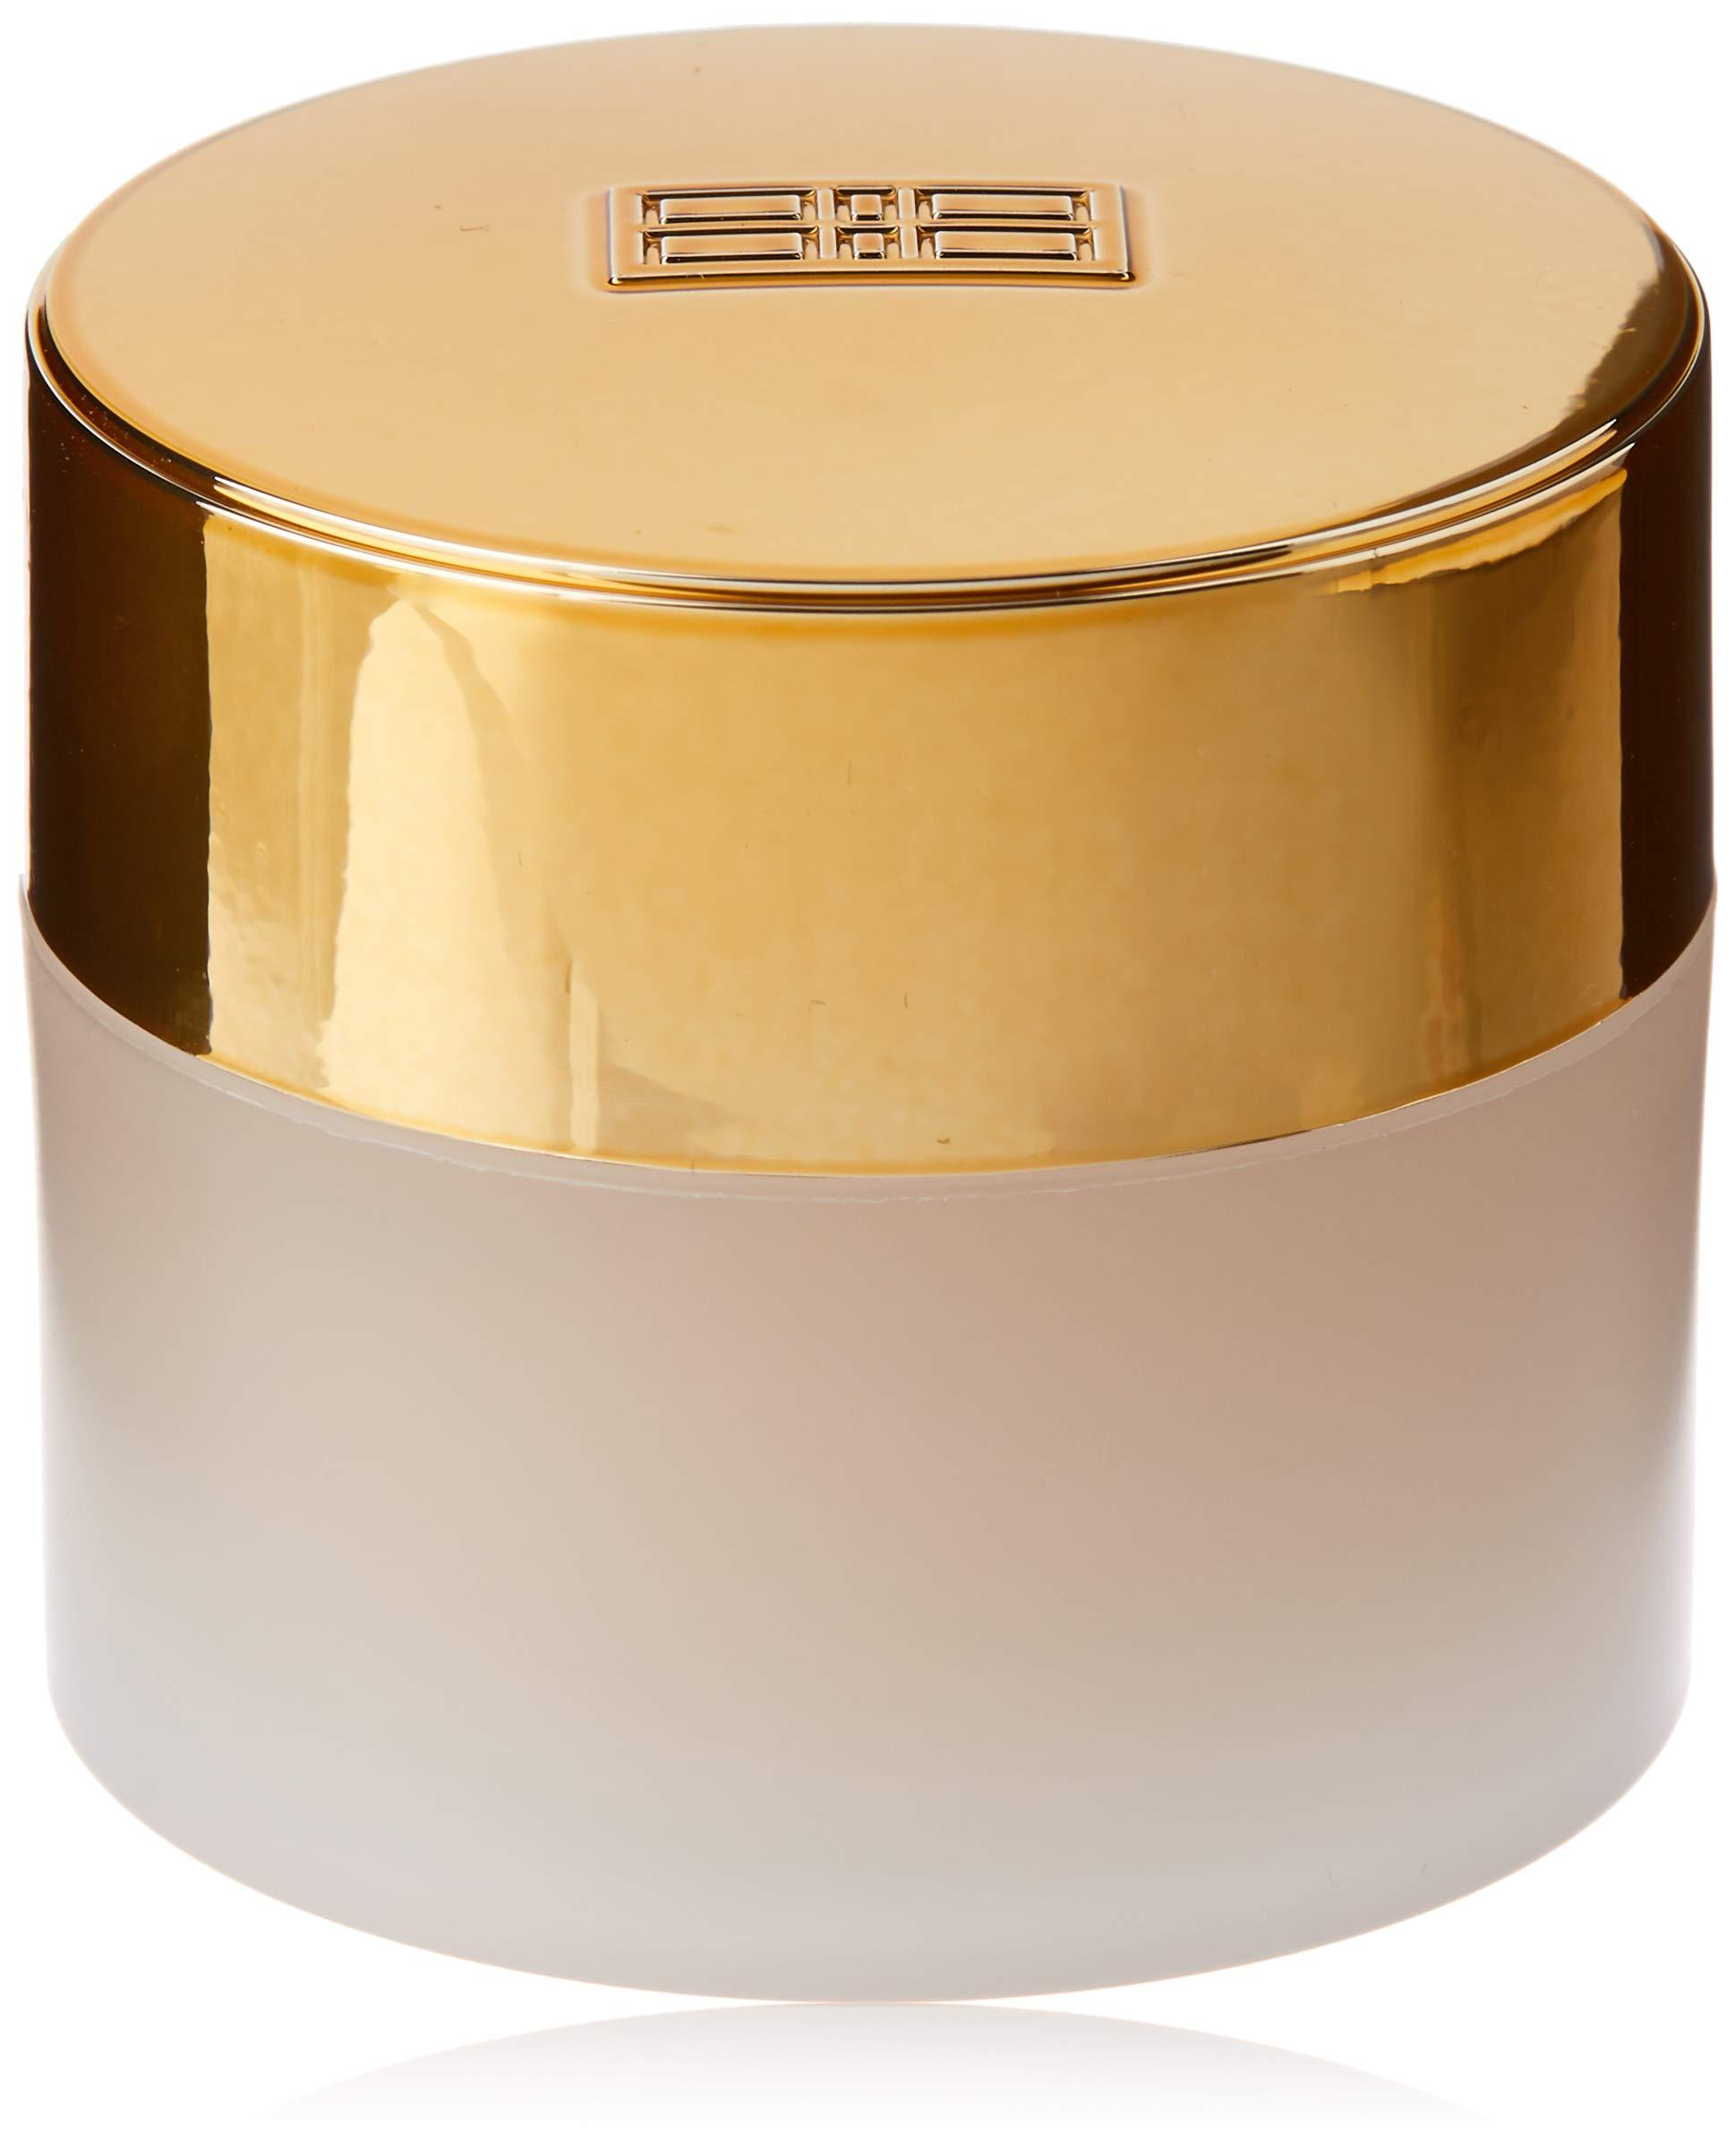 Elizabeth Arden Ceramide Lift & Firm Makeup SPF 15 Broad Spectrum Sunscreen, Vanilla Shell, 1.0 oz.